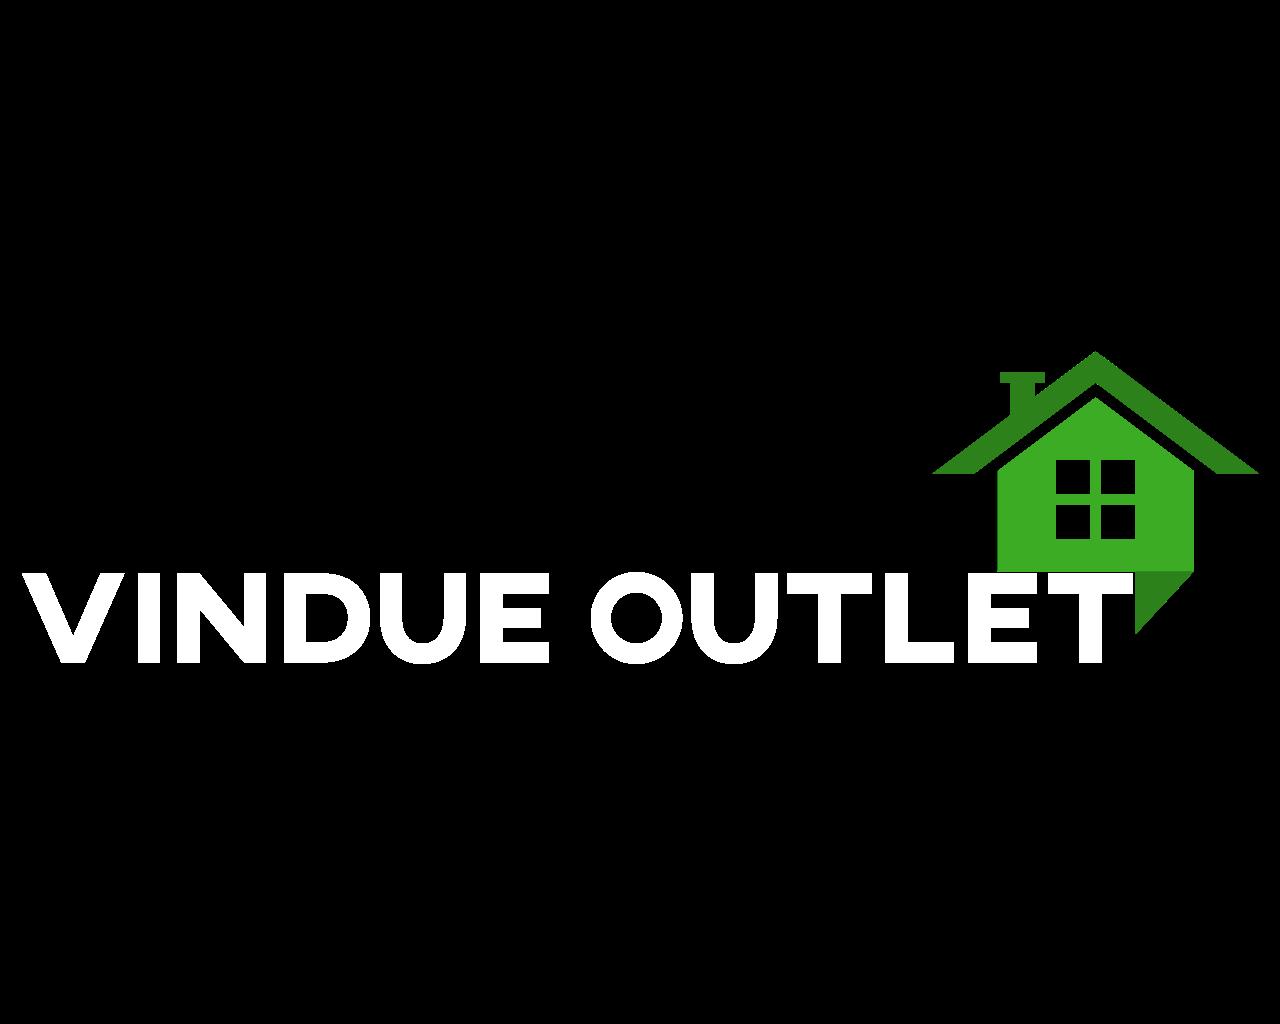 Vindue Outlet